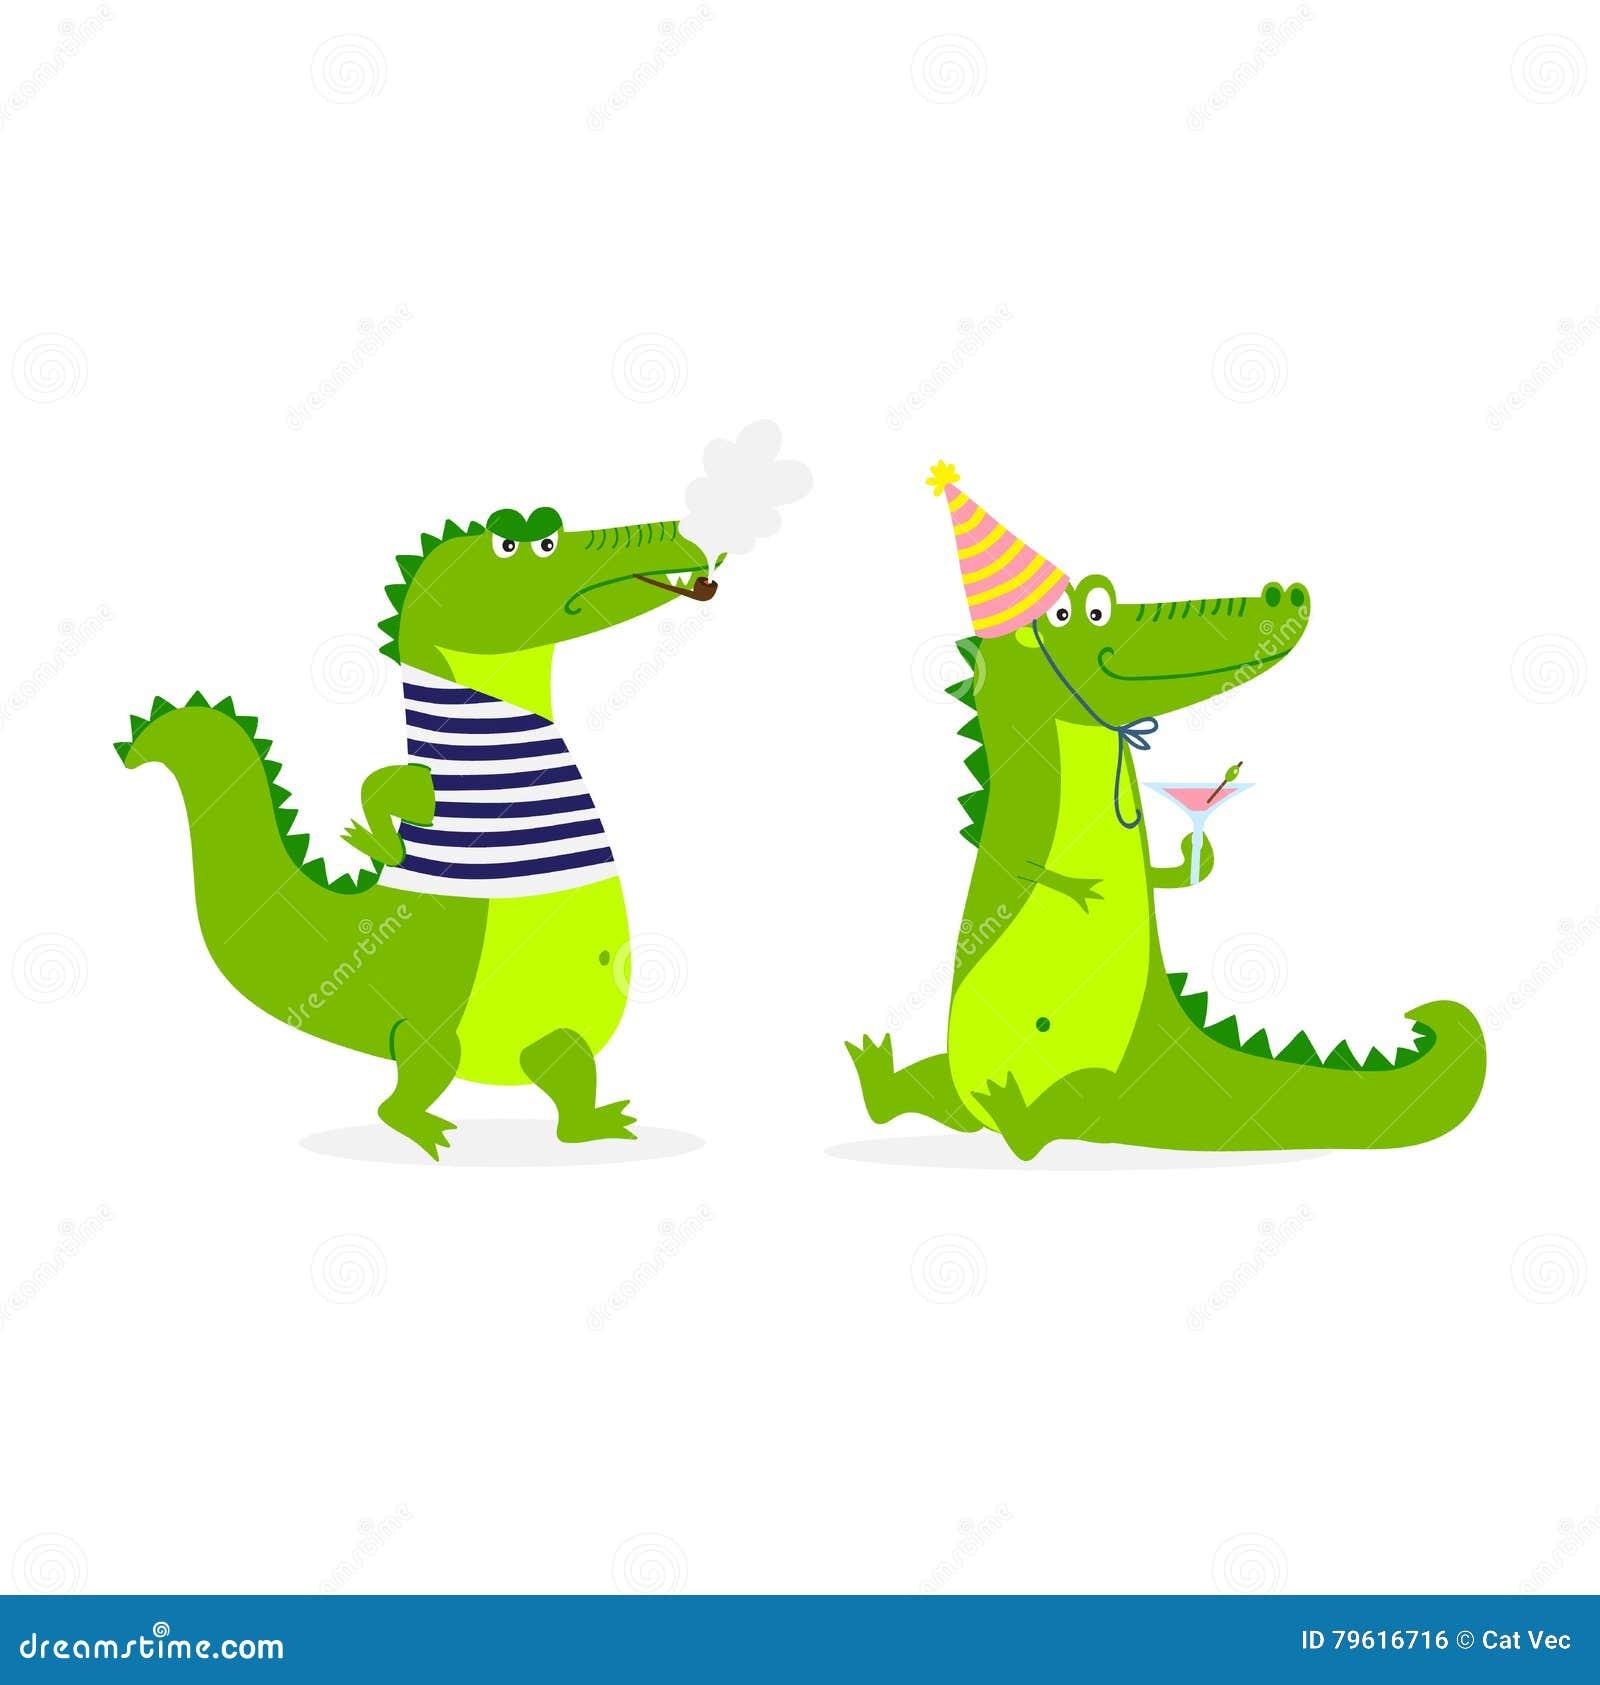 Vetor bonito do caráter do crocodilo